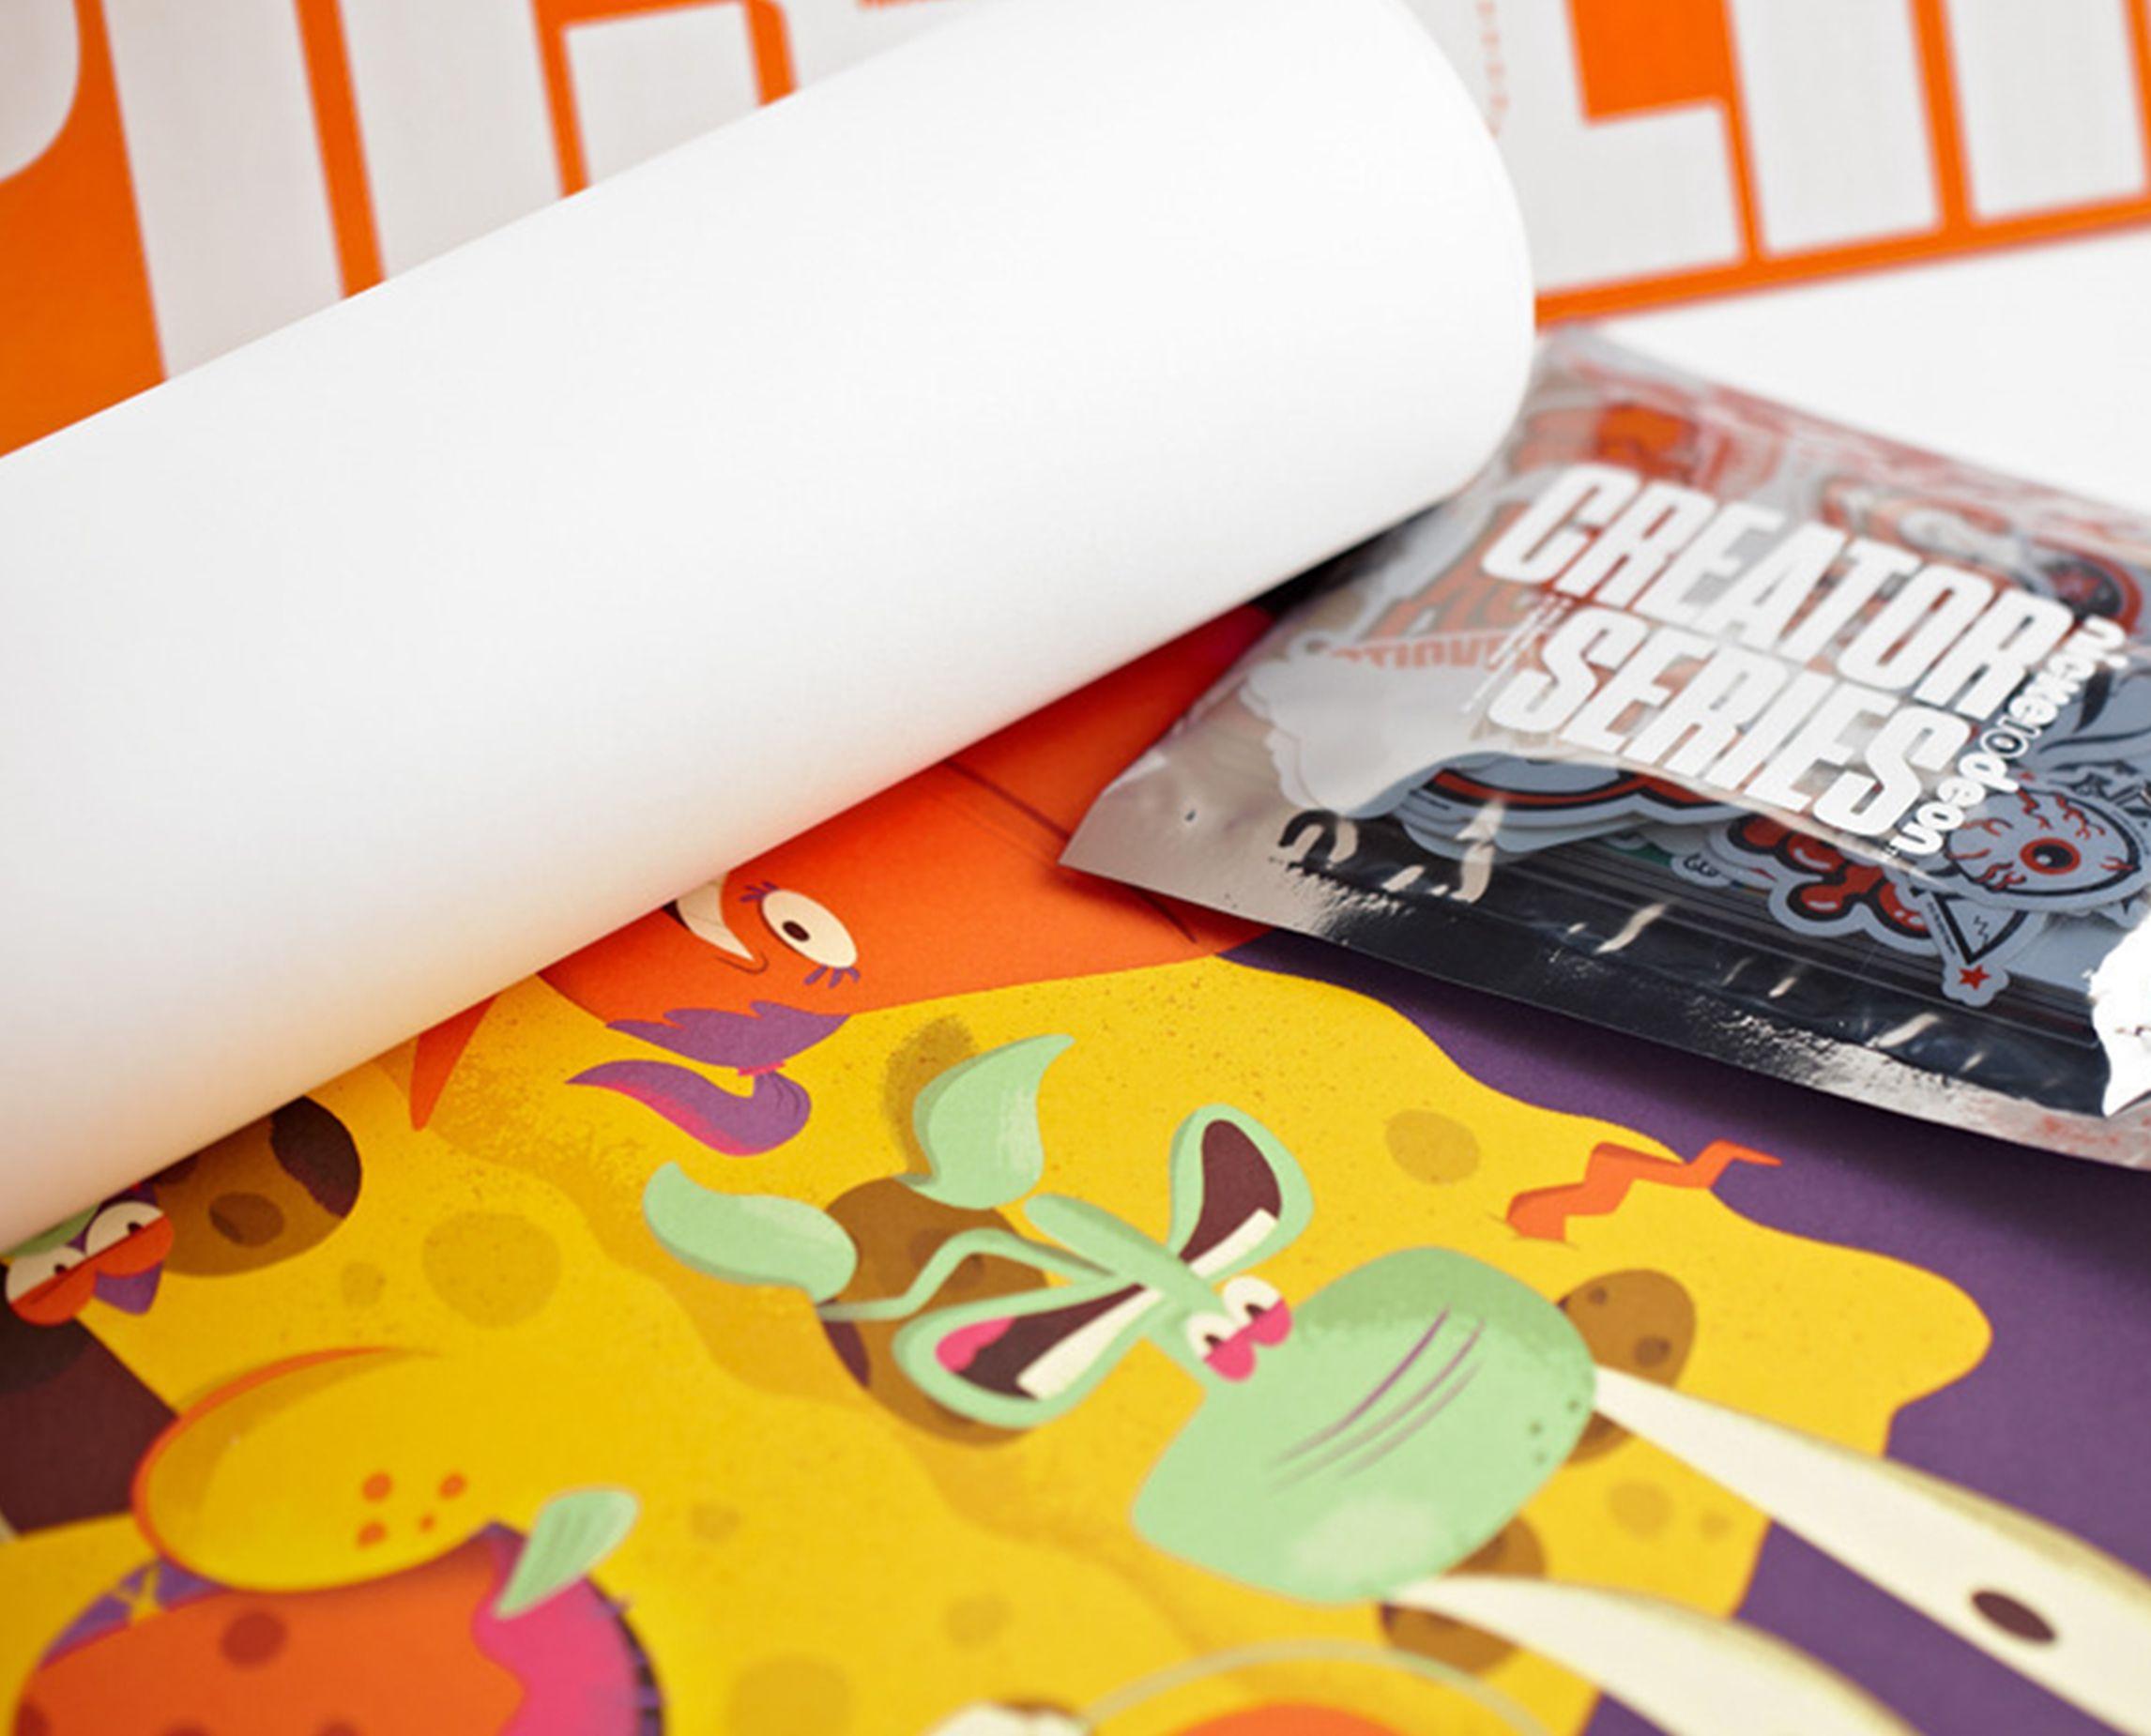 Spongebob poster and creator series sticker pack.